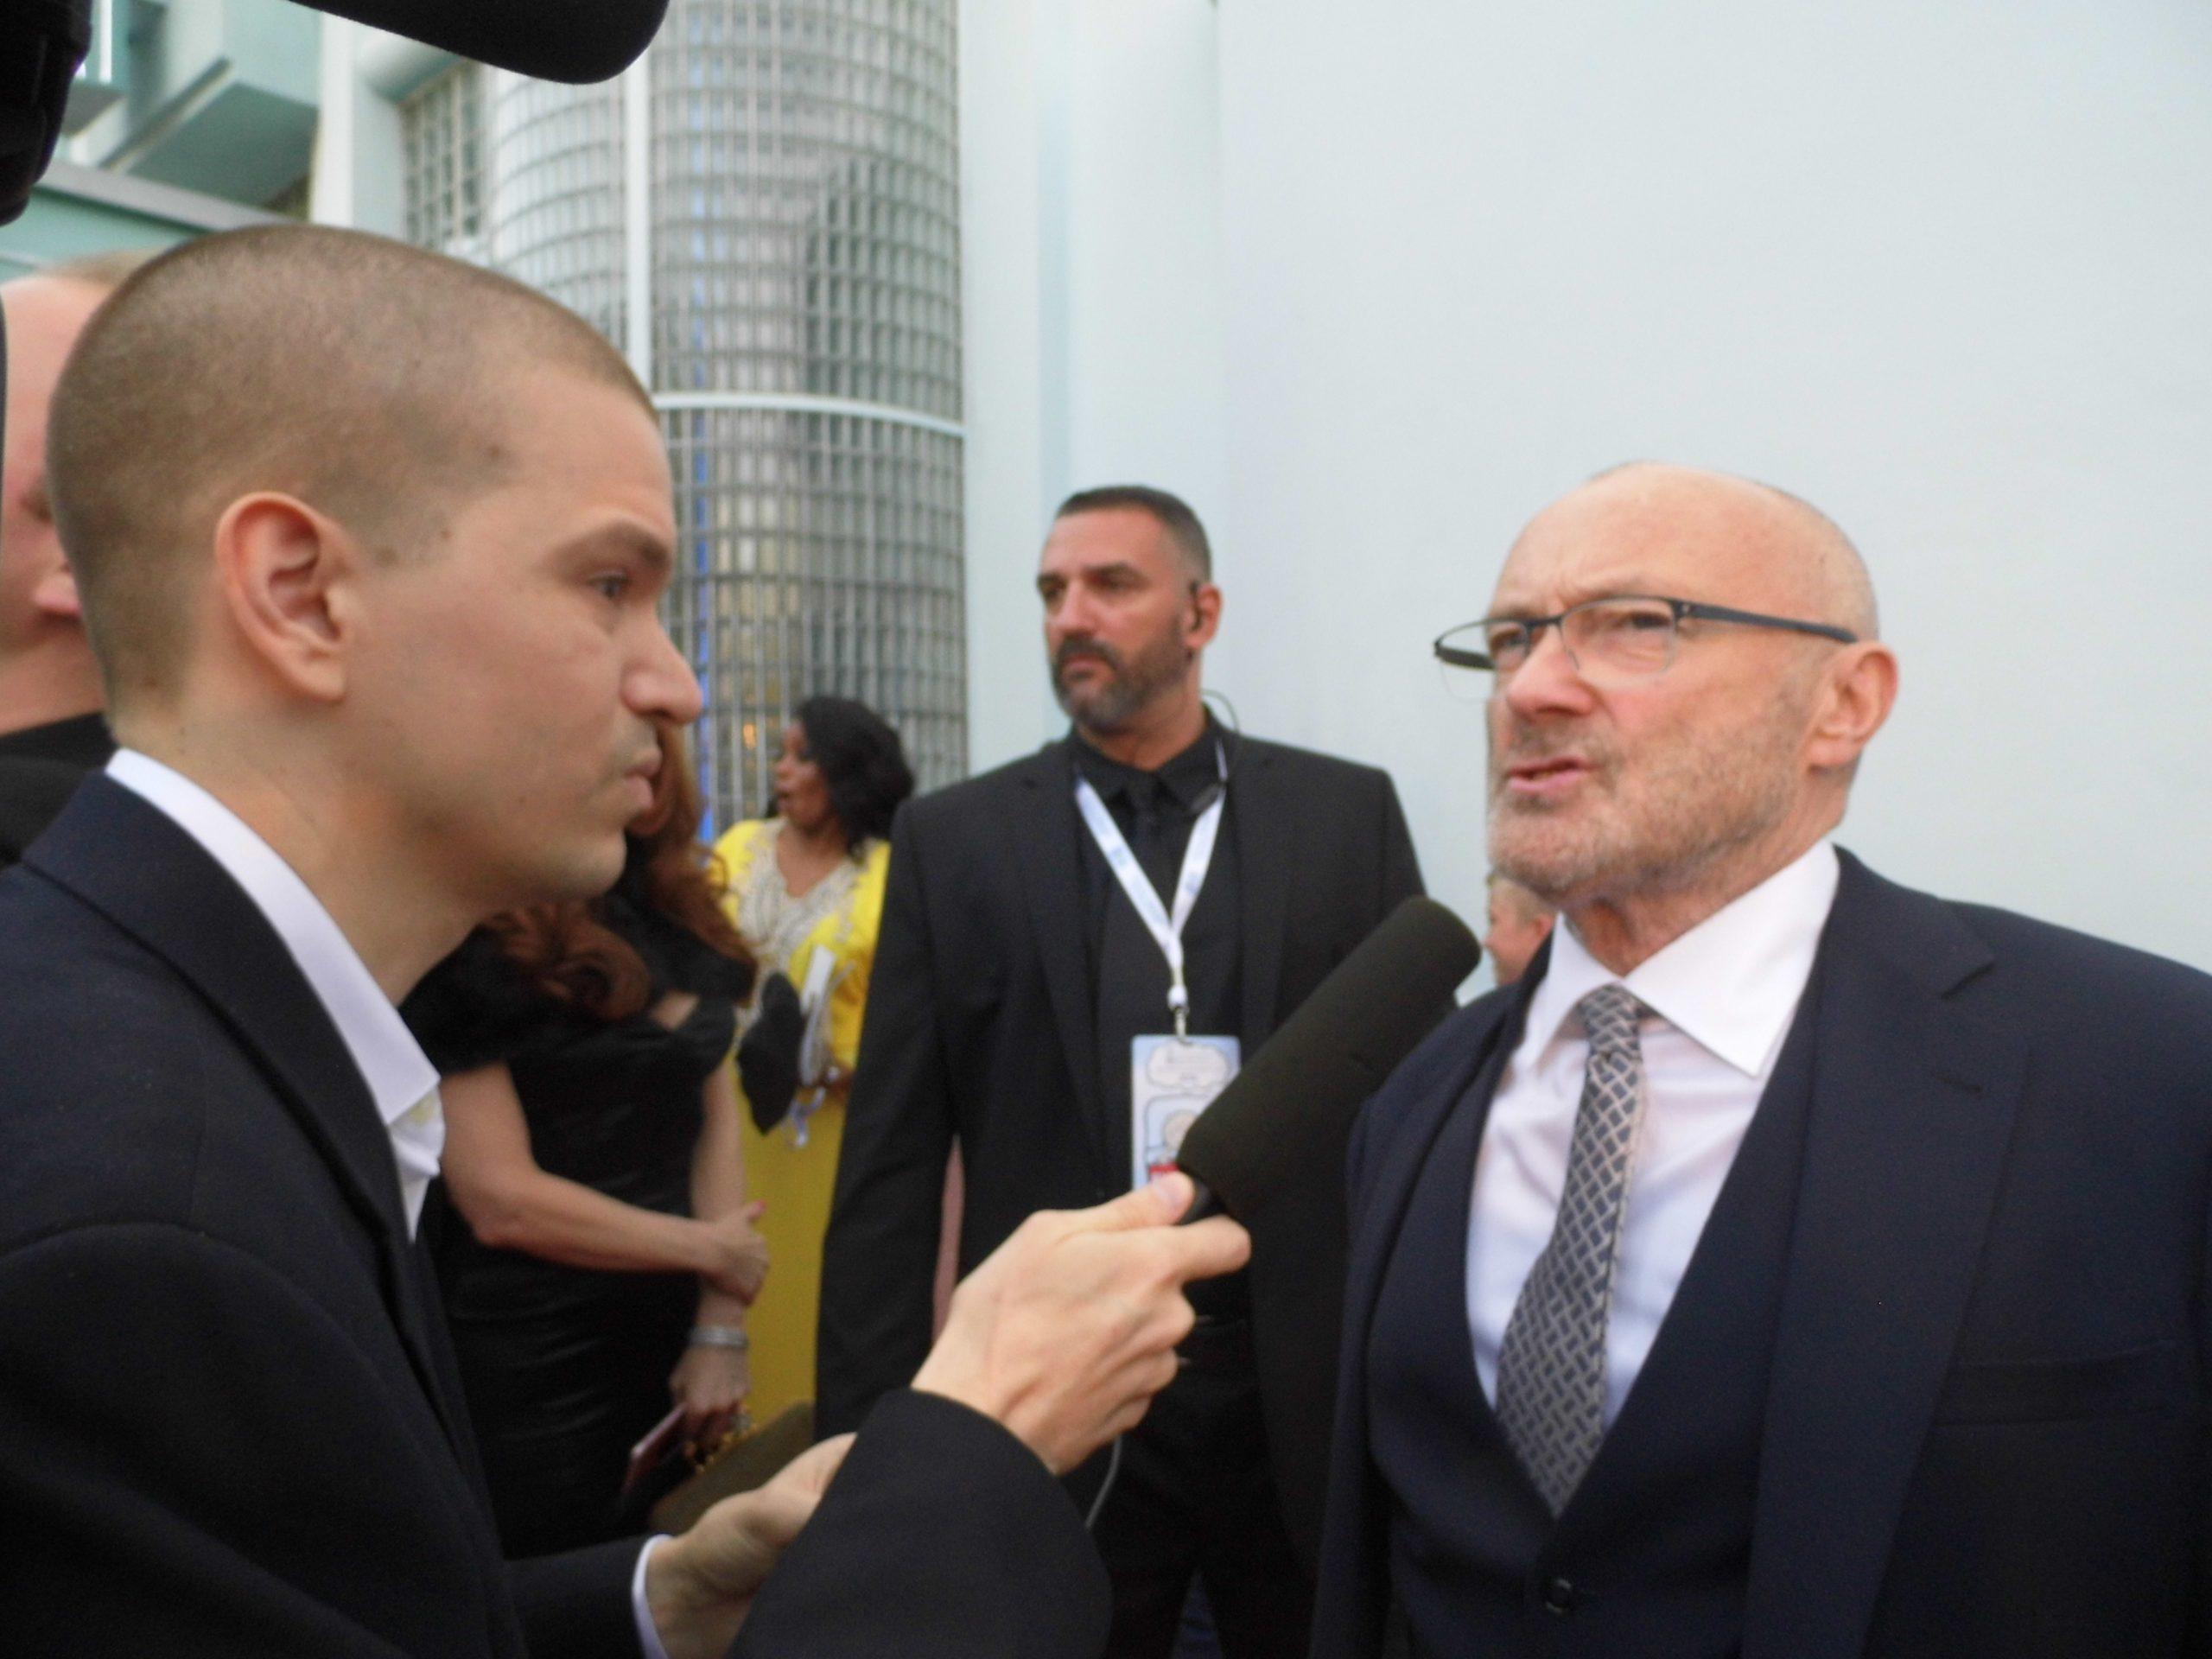 Phil Collins Interview, Phil Collins 2020, Chris Yandek